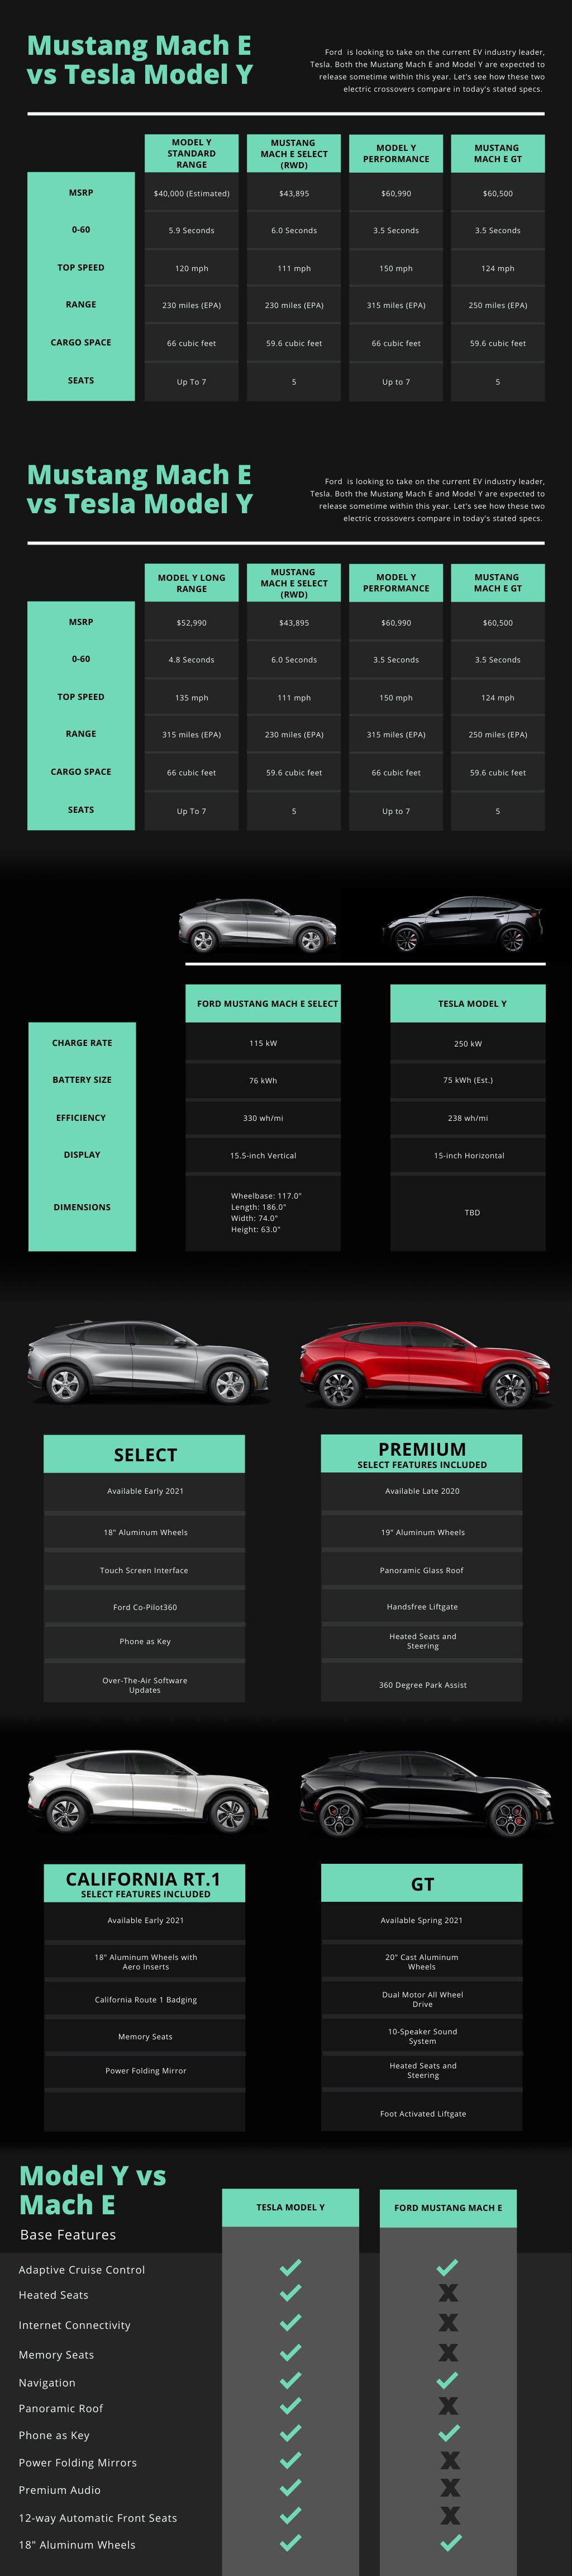 Ford Mustang Mach E vs Tesla Model Y